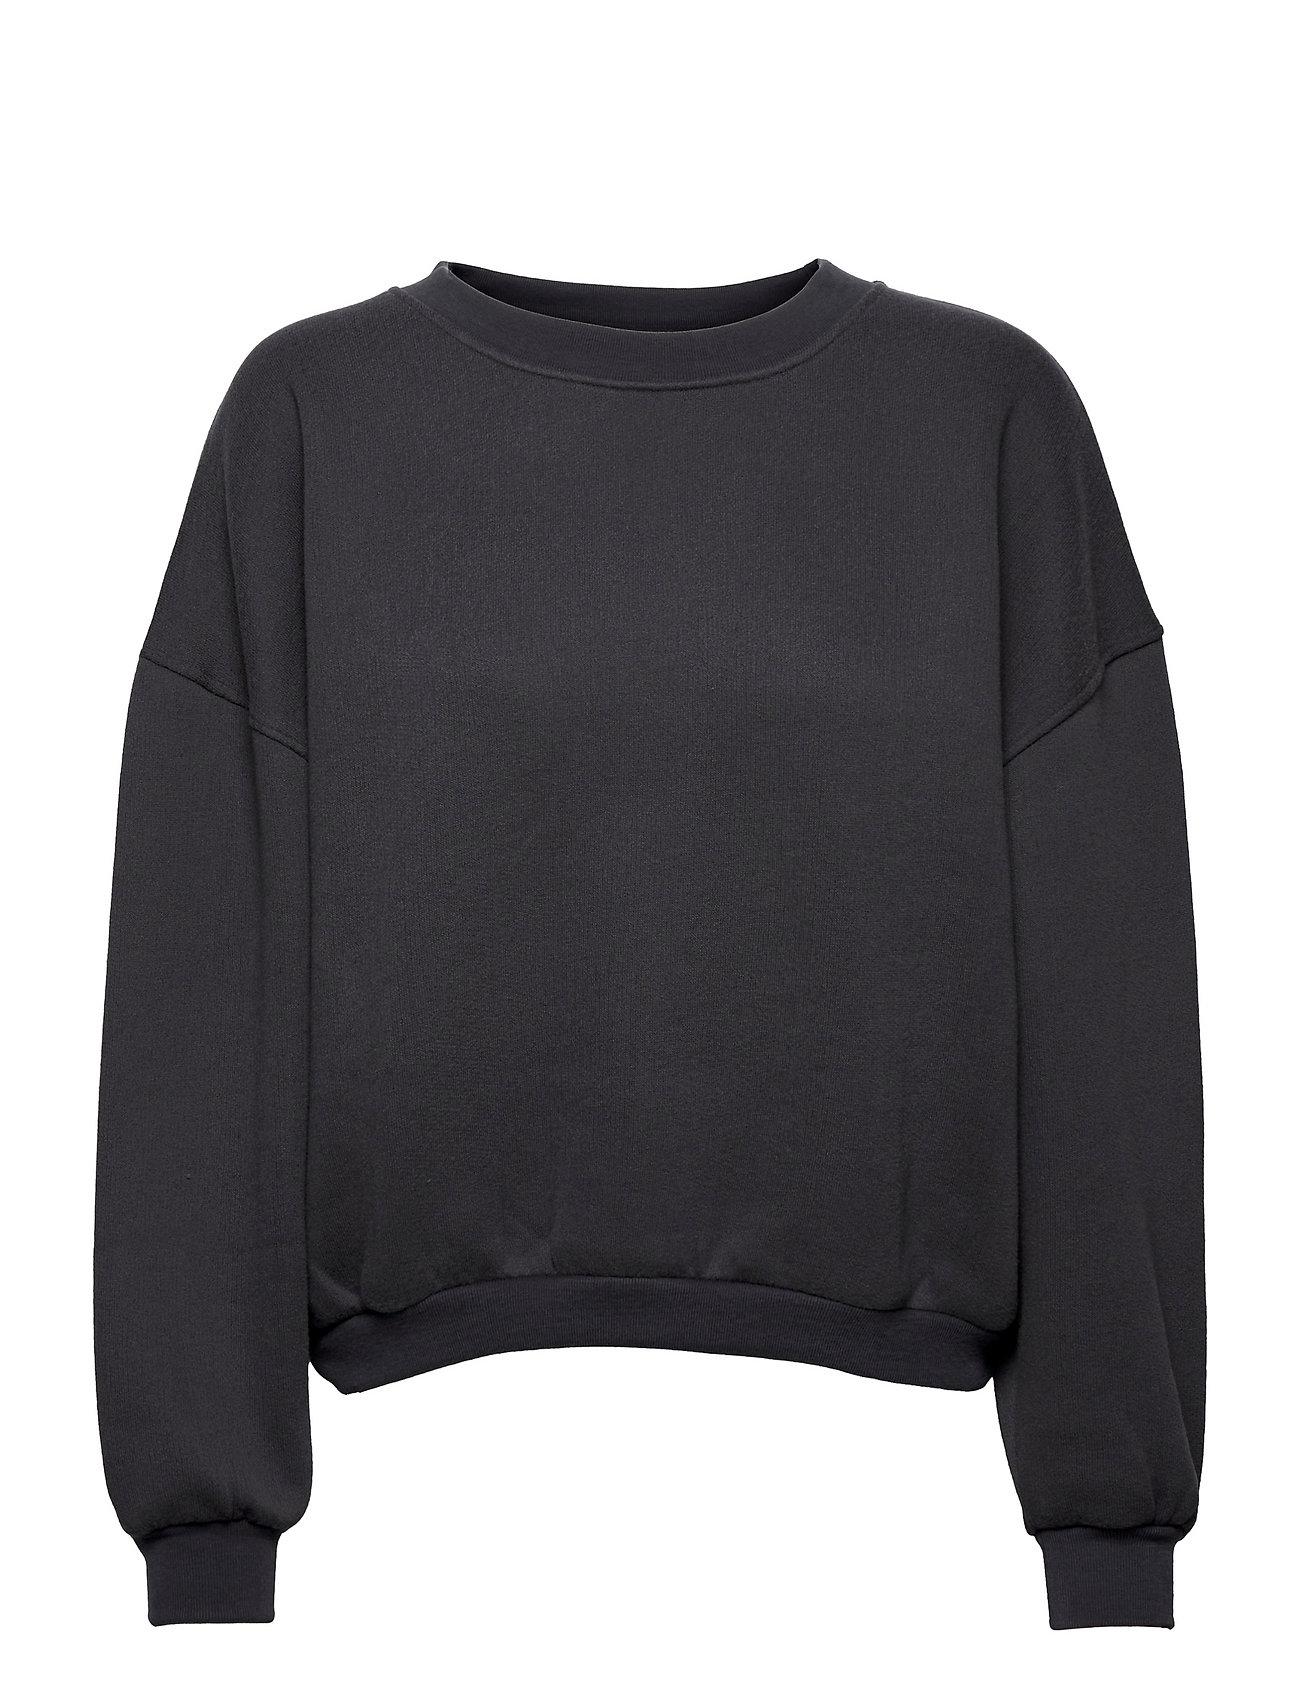 Ikatown Sweatshirt Trøje Grå American Vintage